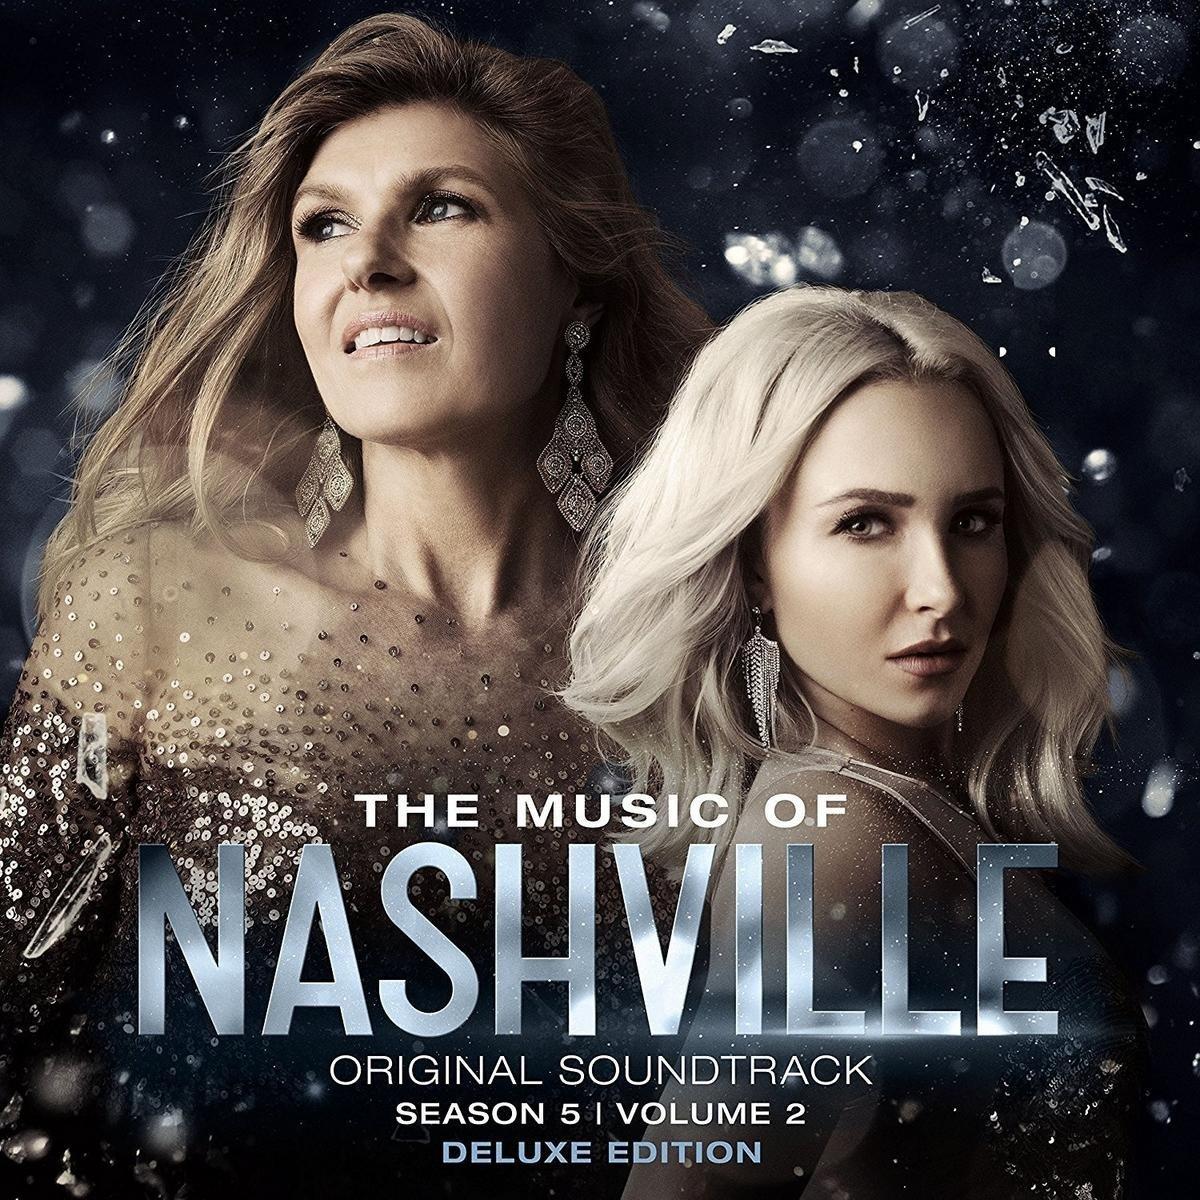 Double wedding soundtrack - Nashville The Music Of Nashville Season 5 Volume 2 Deluxe Soundtrack